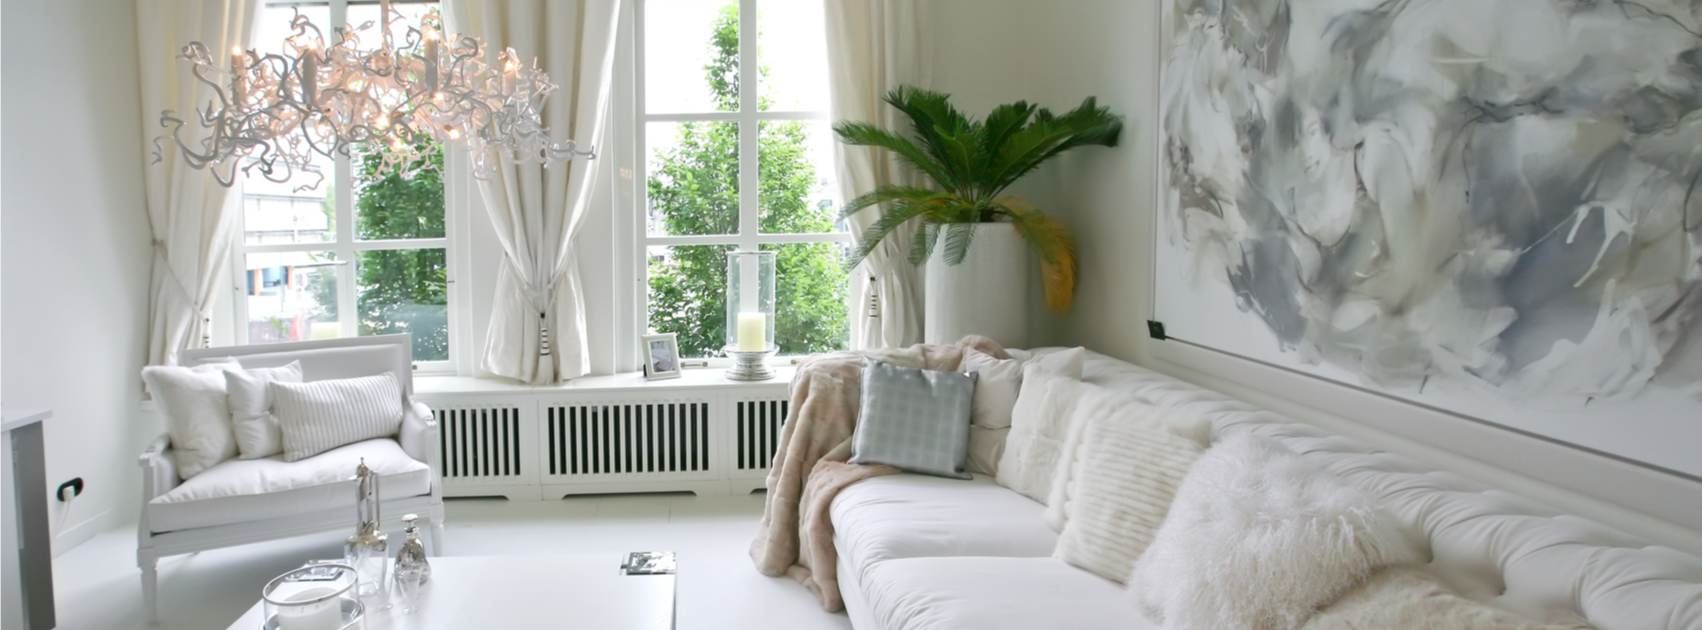 Vardagsrum i vitt